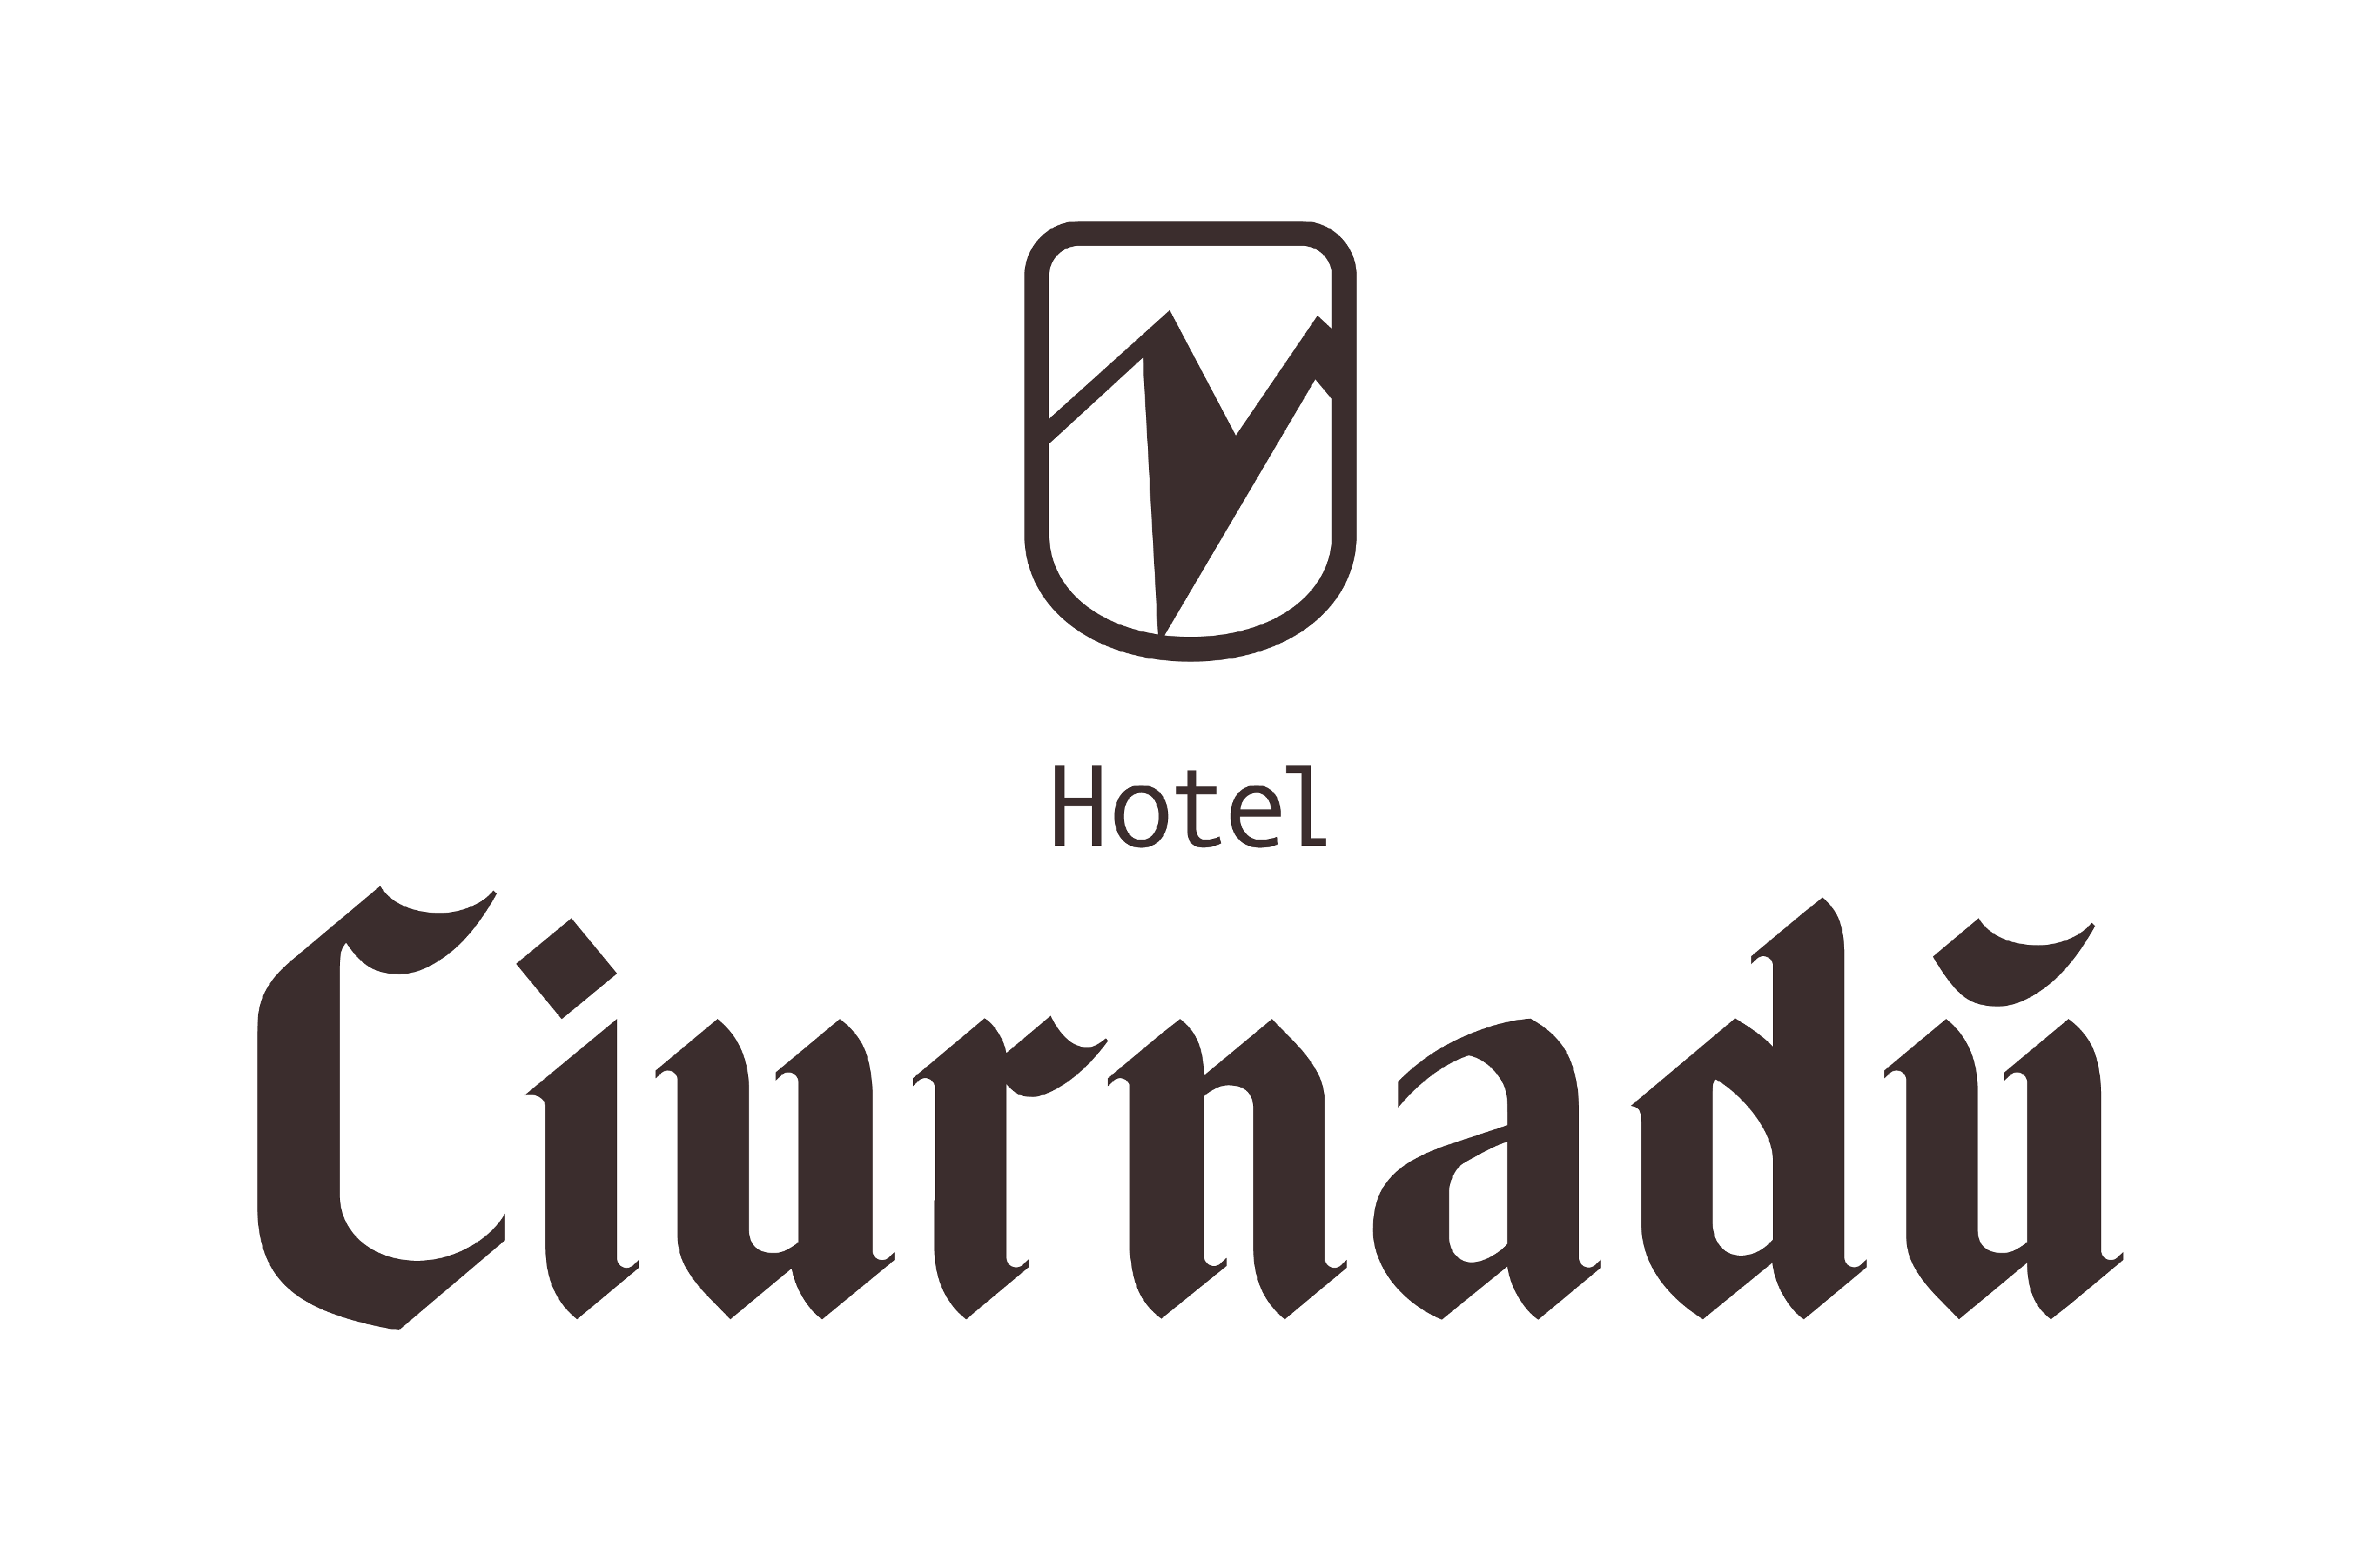 Logo Hotel Ciurnadú